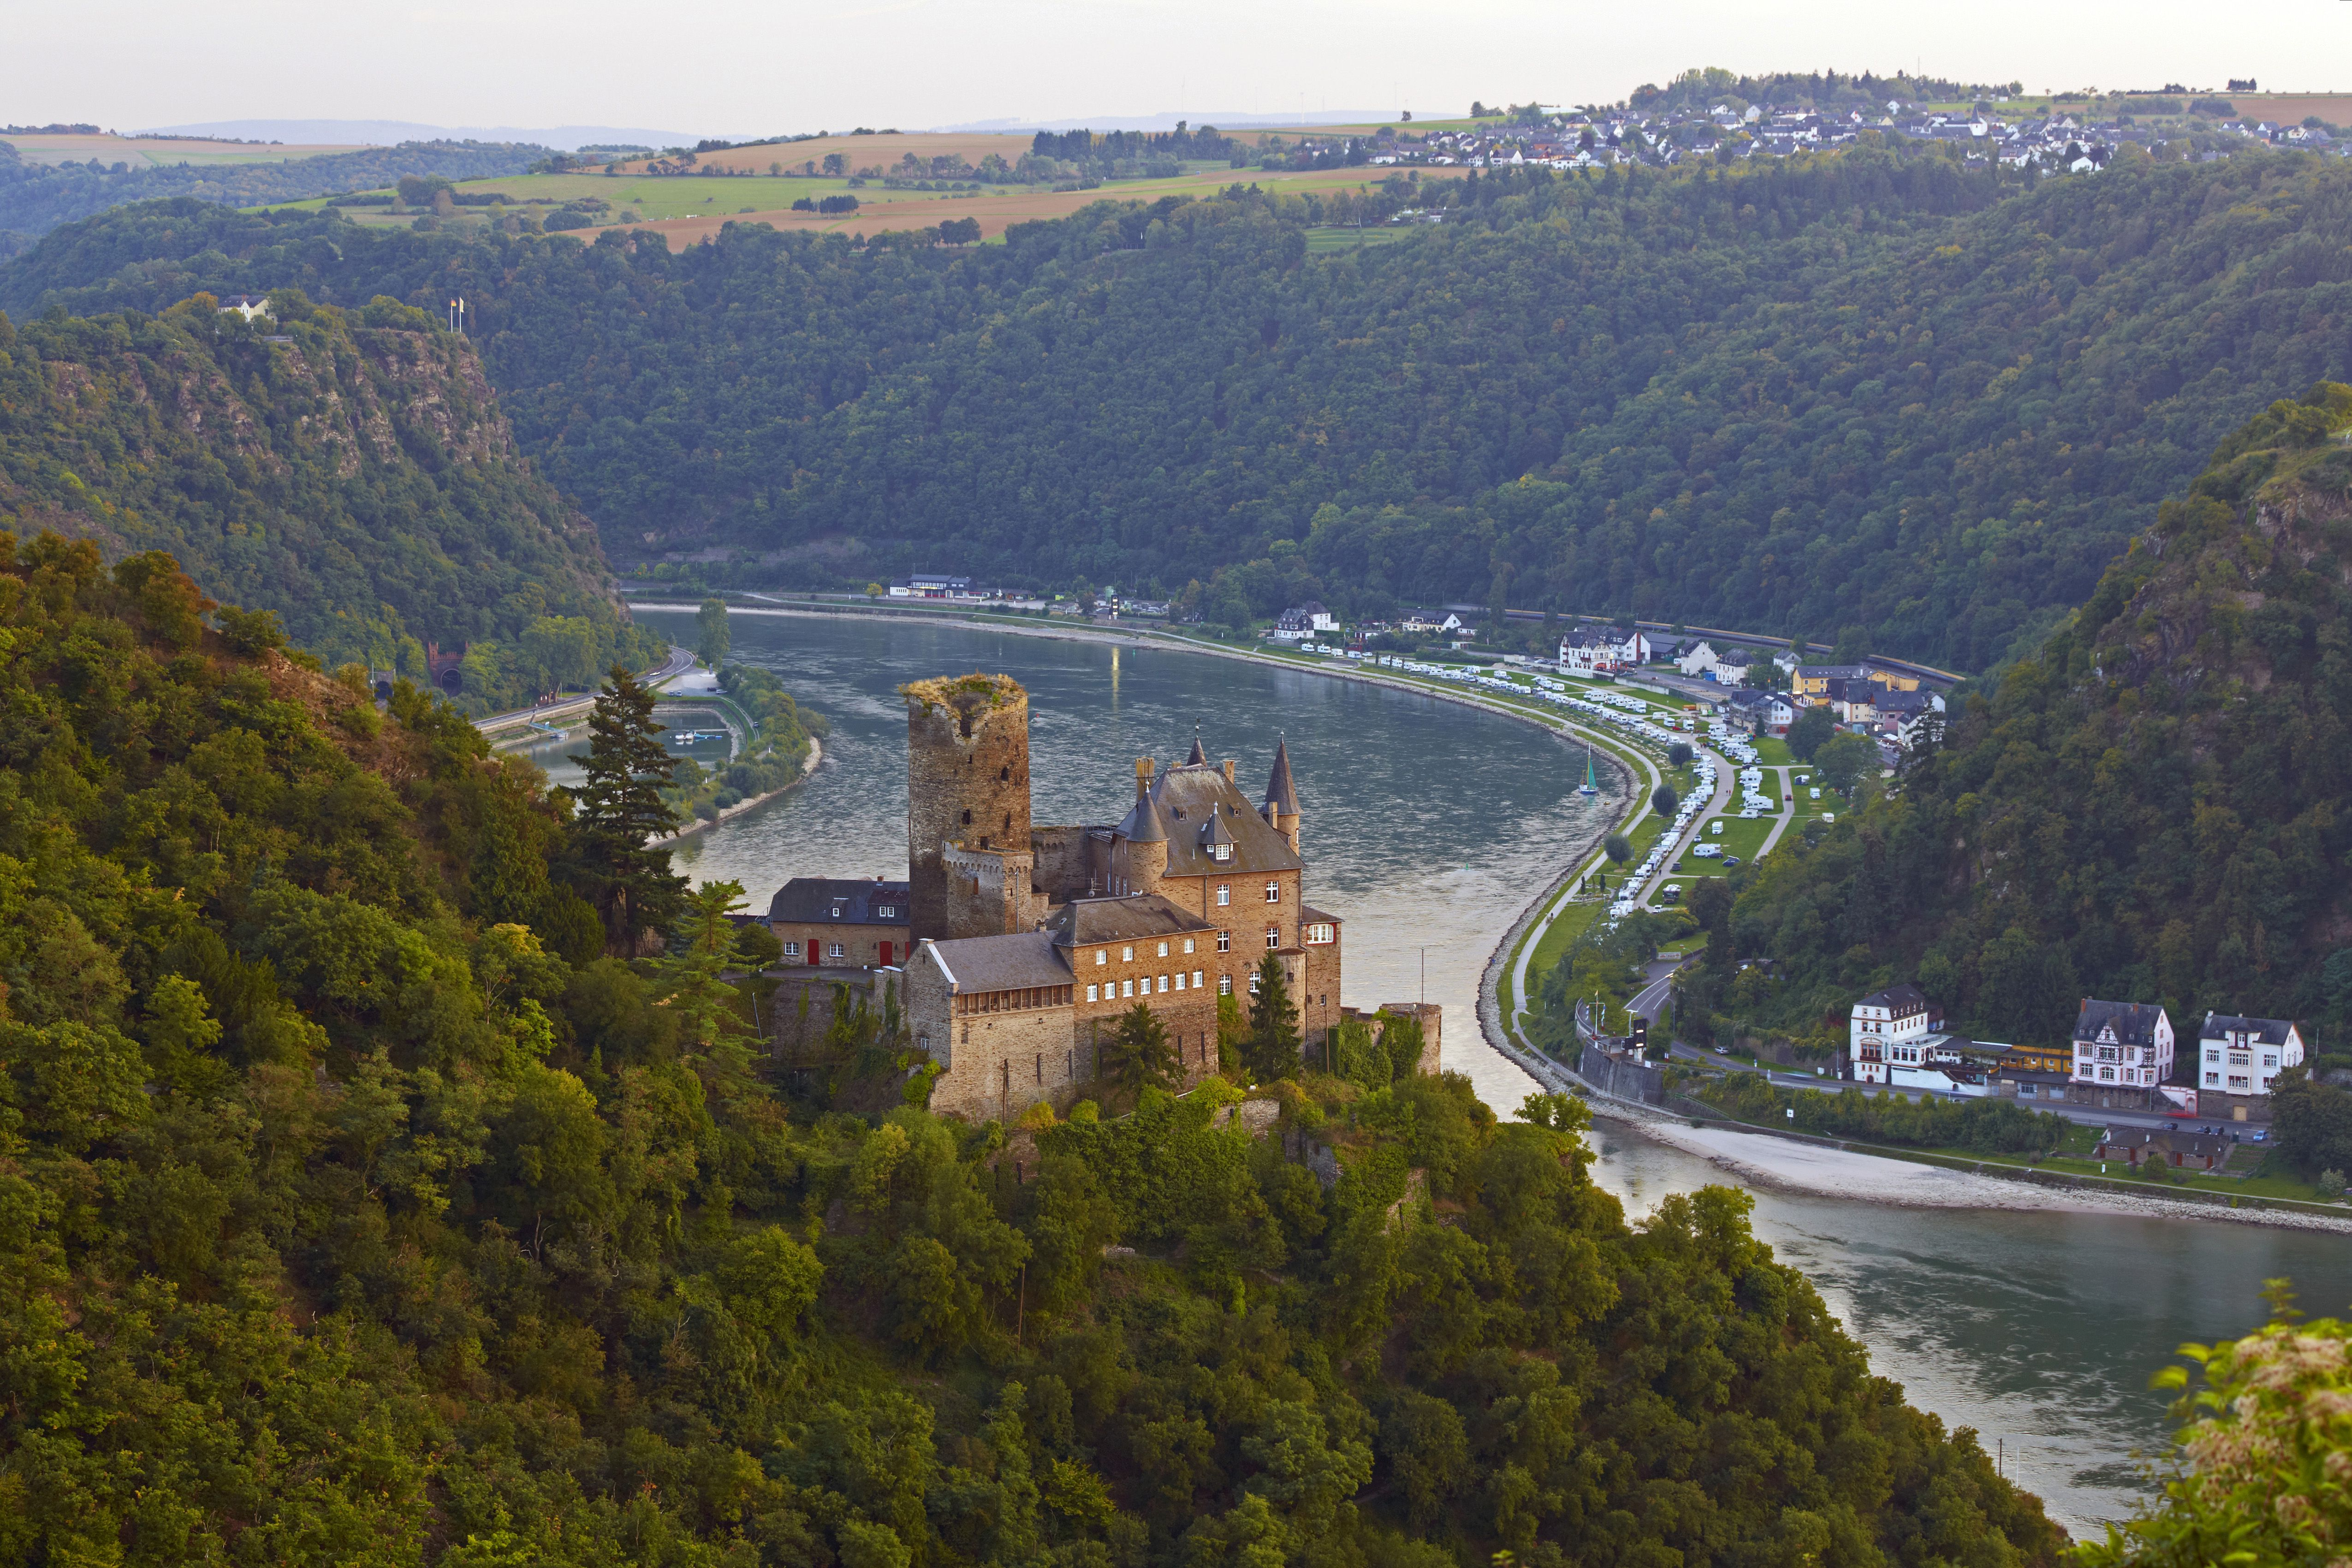 View towards Burg Katz and Loreley, Mittelrhein, Middle Rhine, Rhineland - Palatinate, Germany